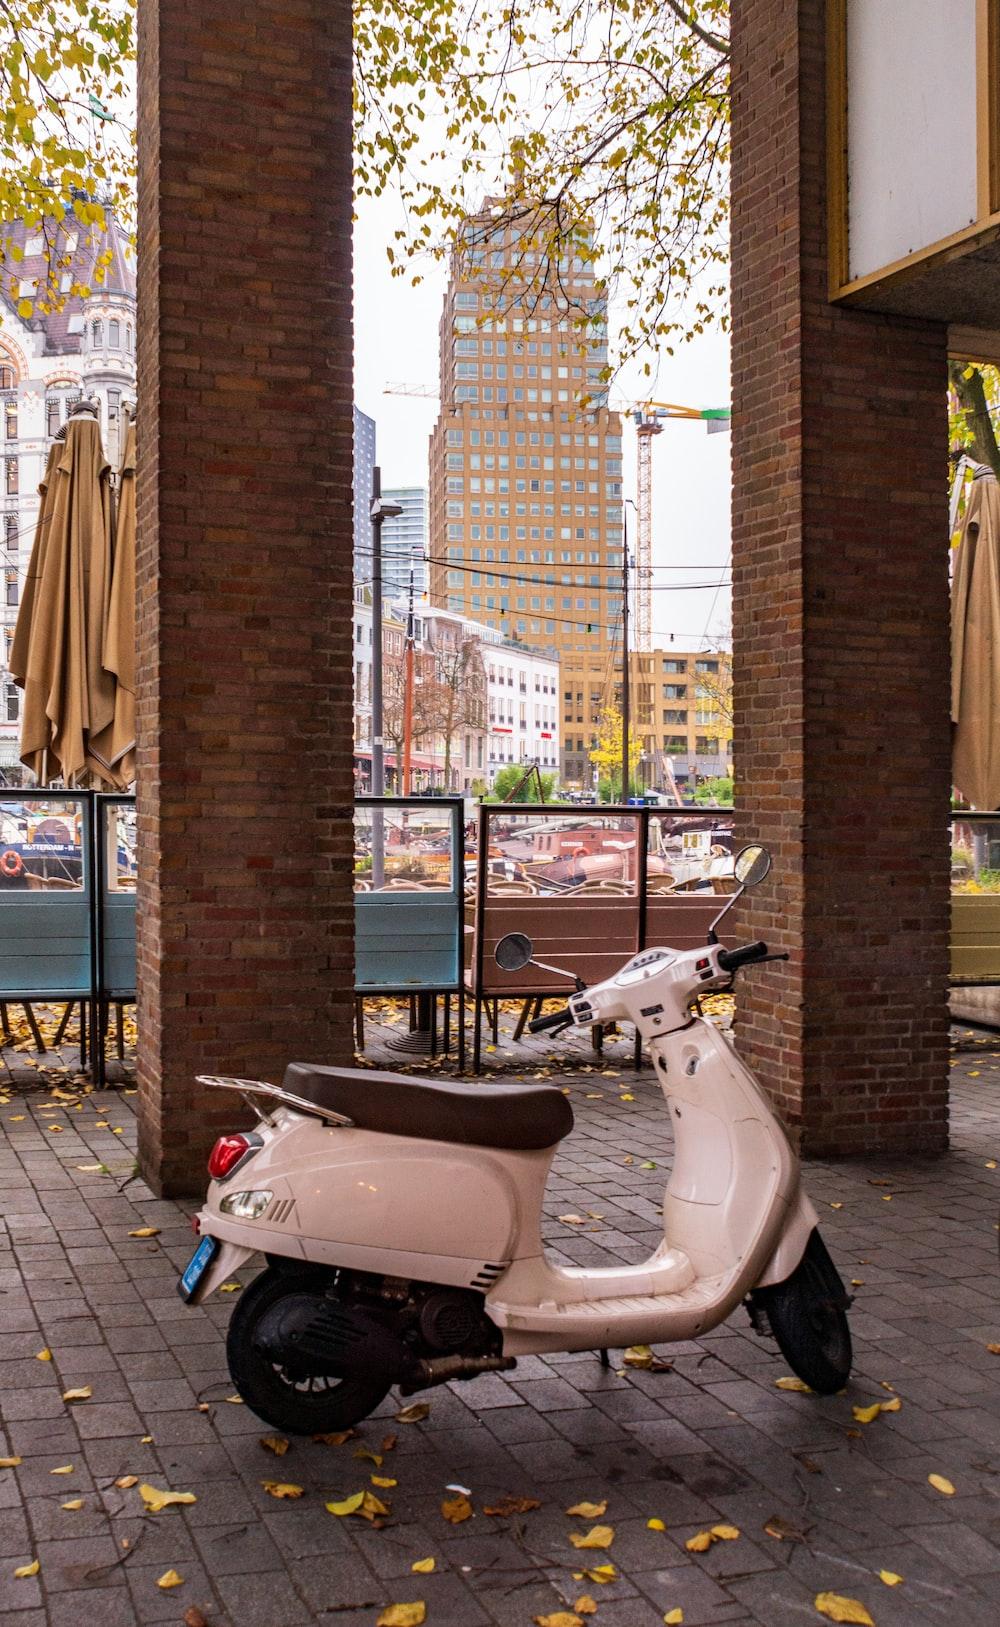 white motor scooter parked near pillars